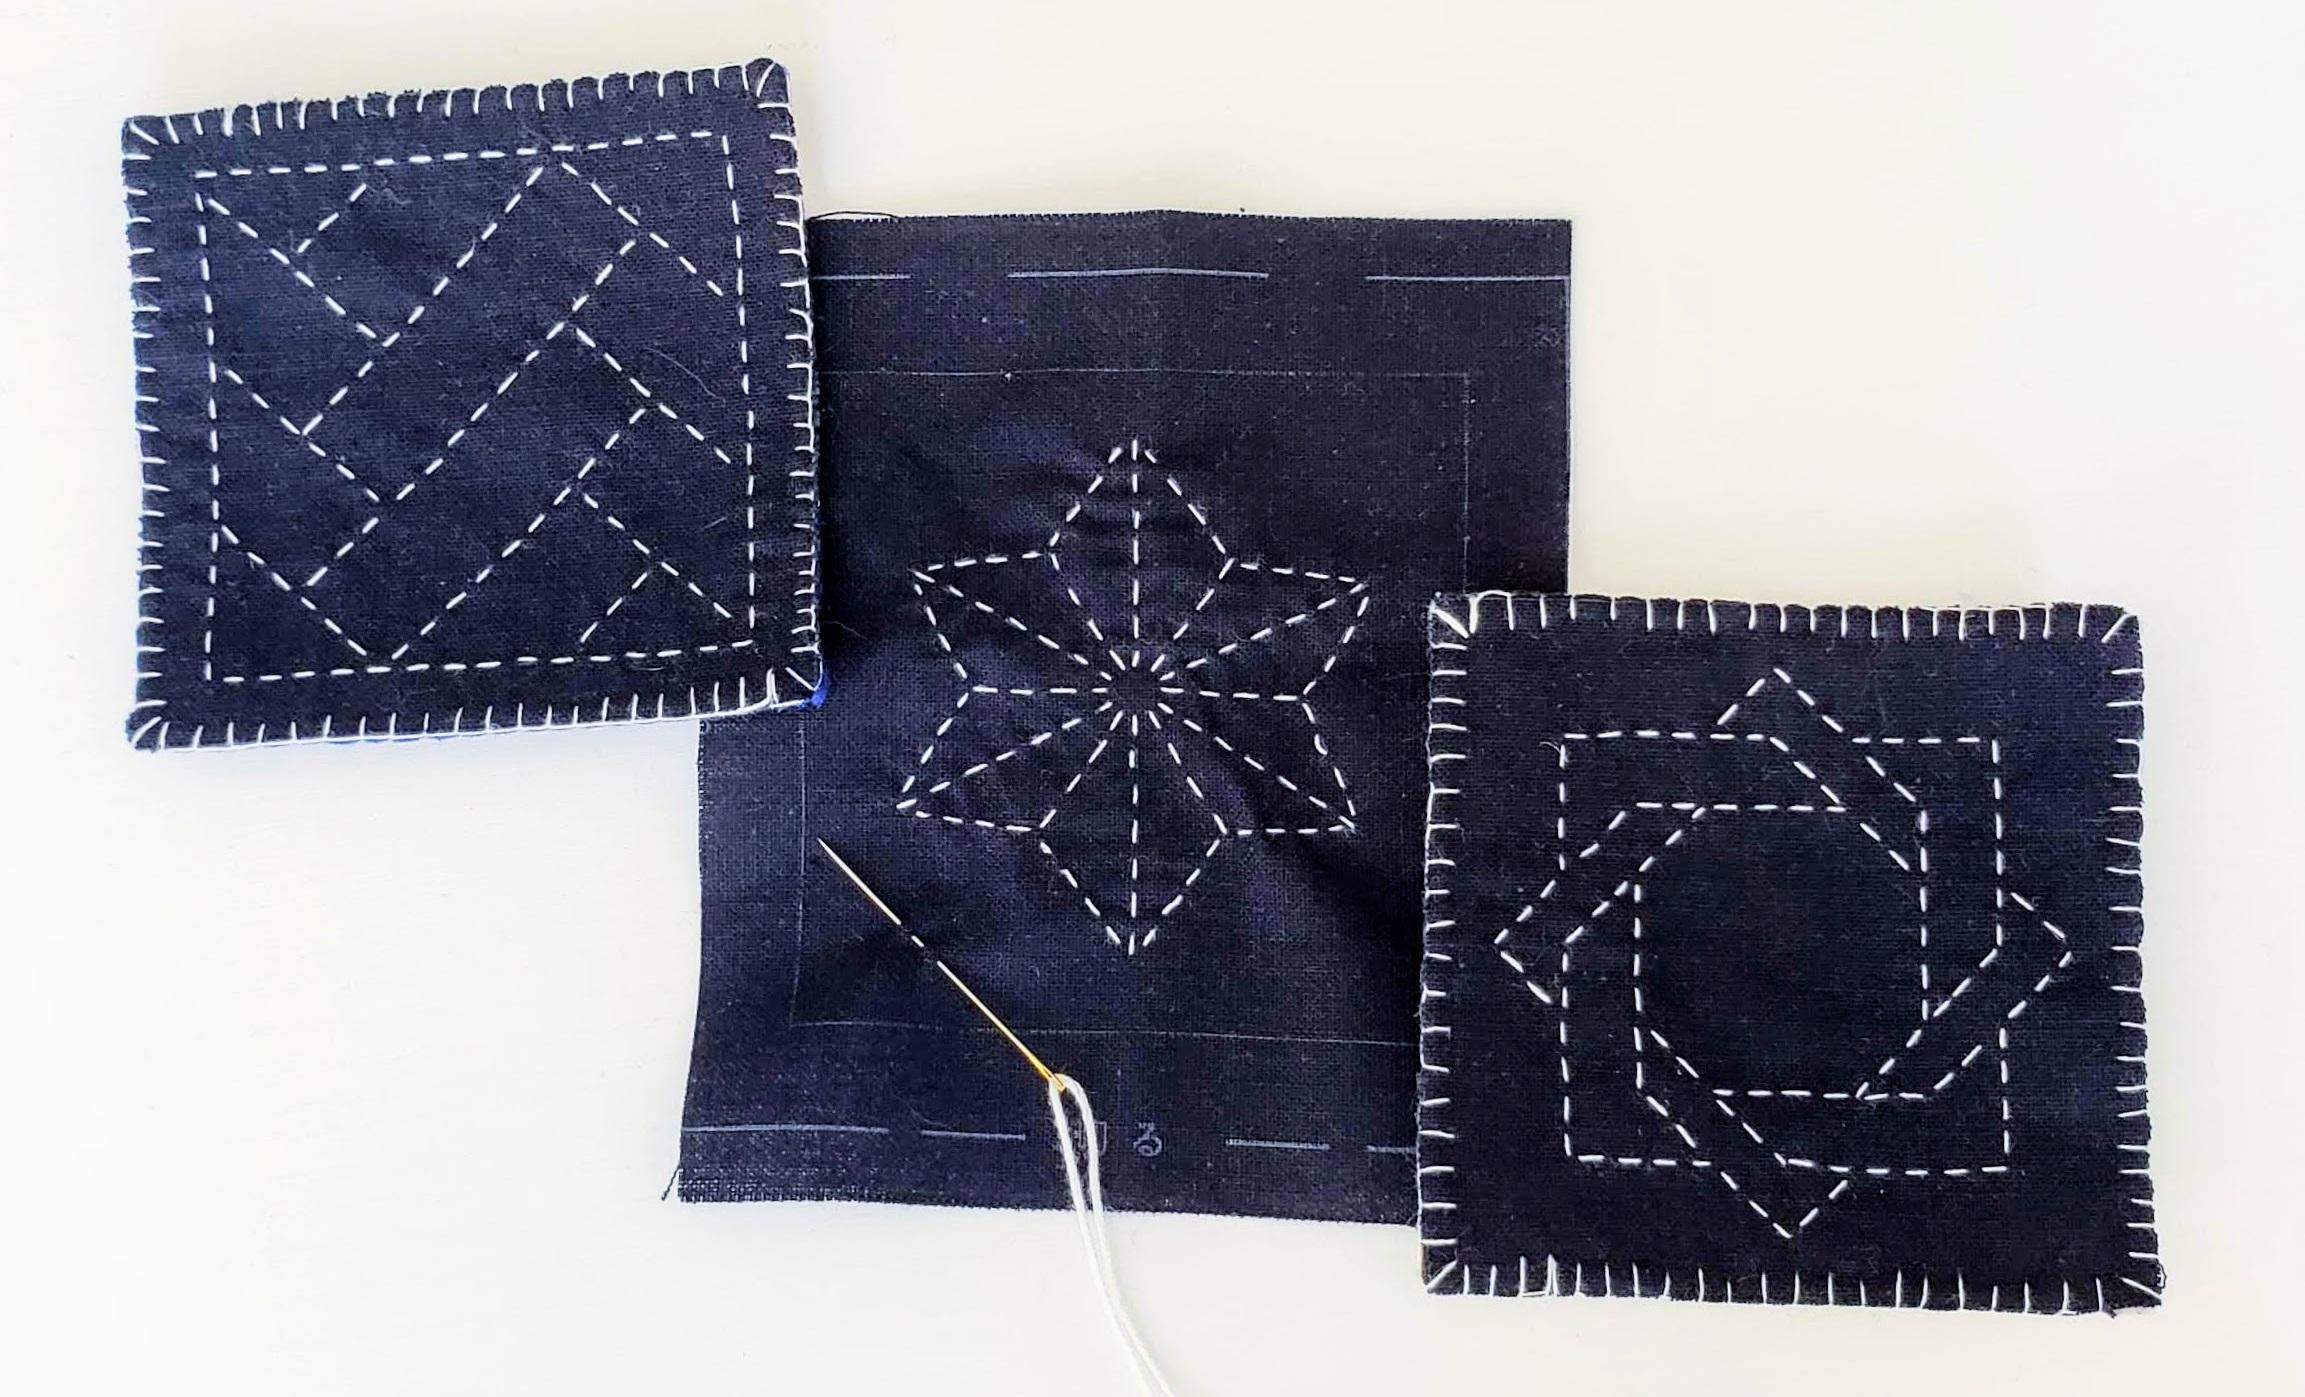 sashiko-embroidery-class-portland